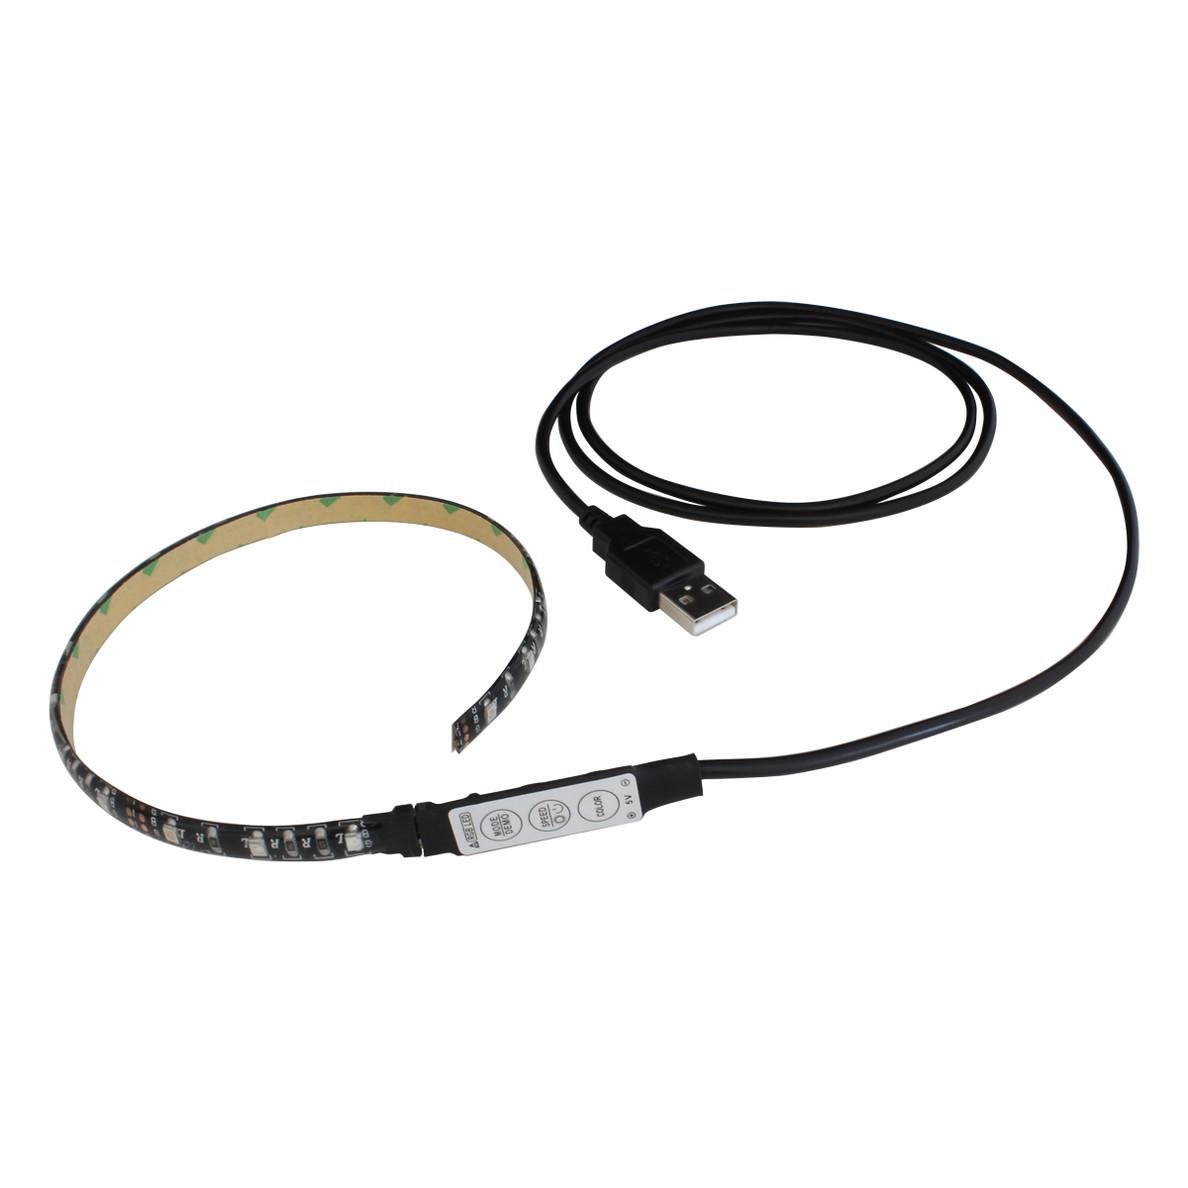 USBグッズ, その他 Kaito6971(1) USB LED RGB(3528) 50cm DC5V